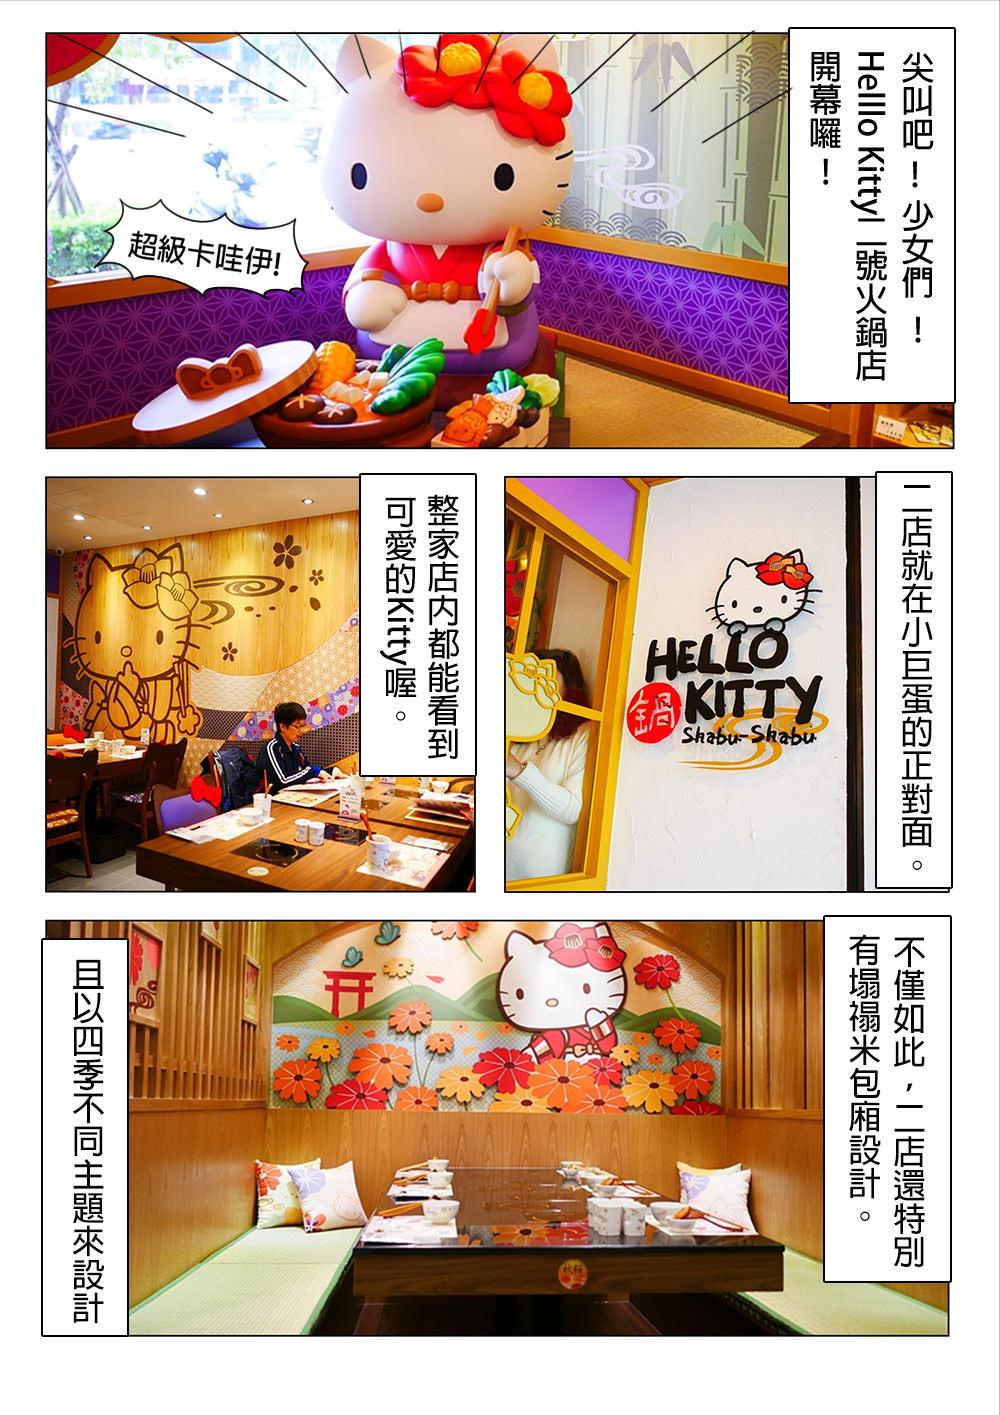 Hello Kitty 火鍋 二號店 (南京店) 台北小巨蛋  Shabushabu